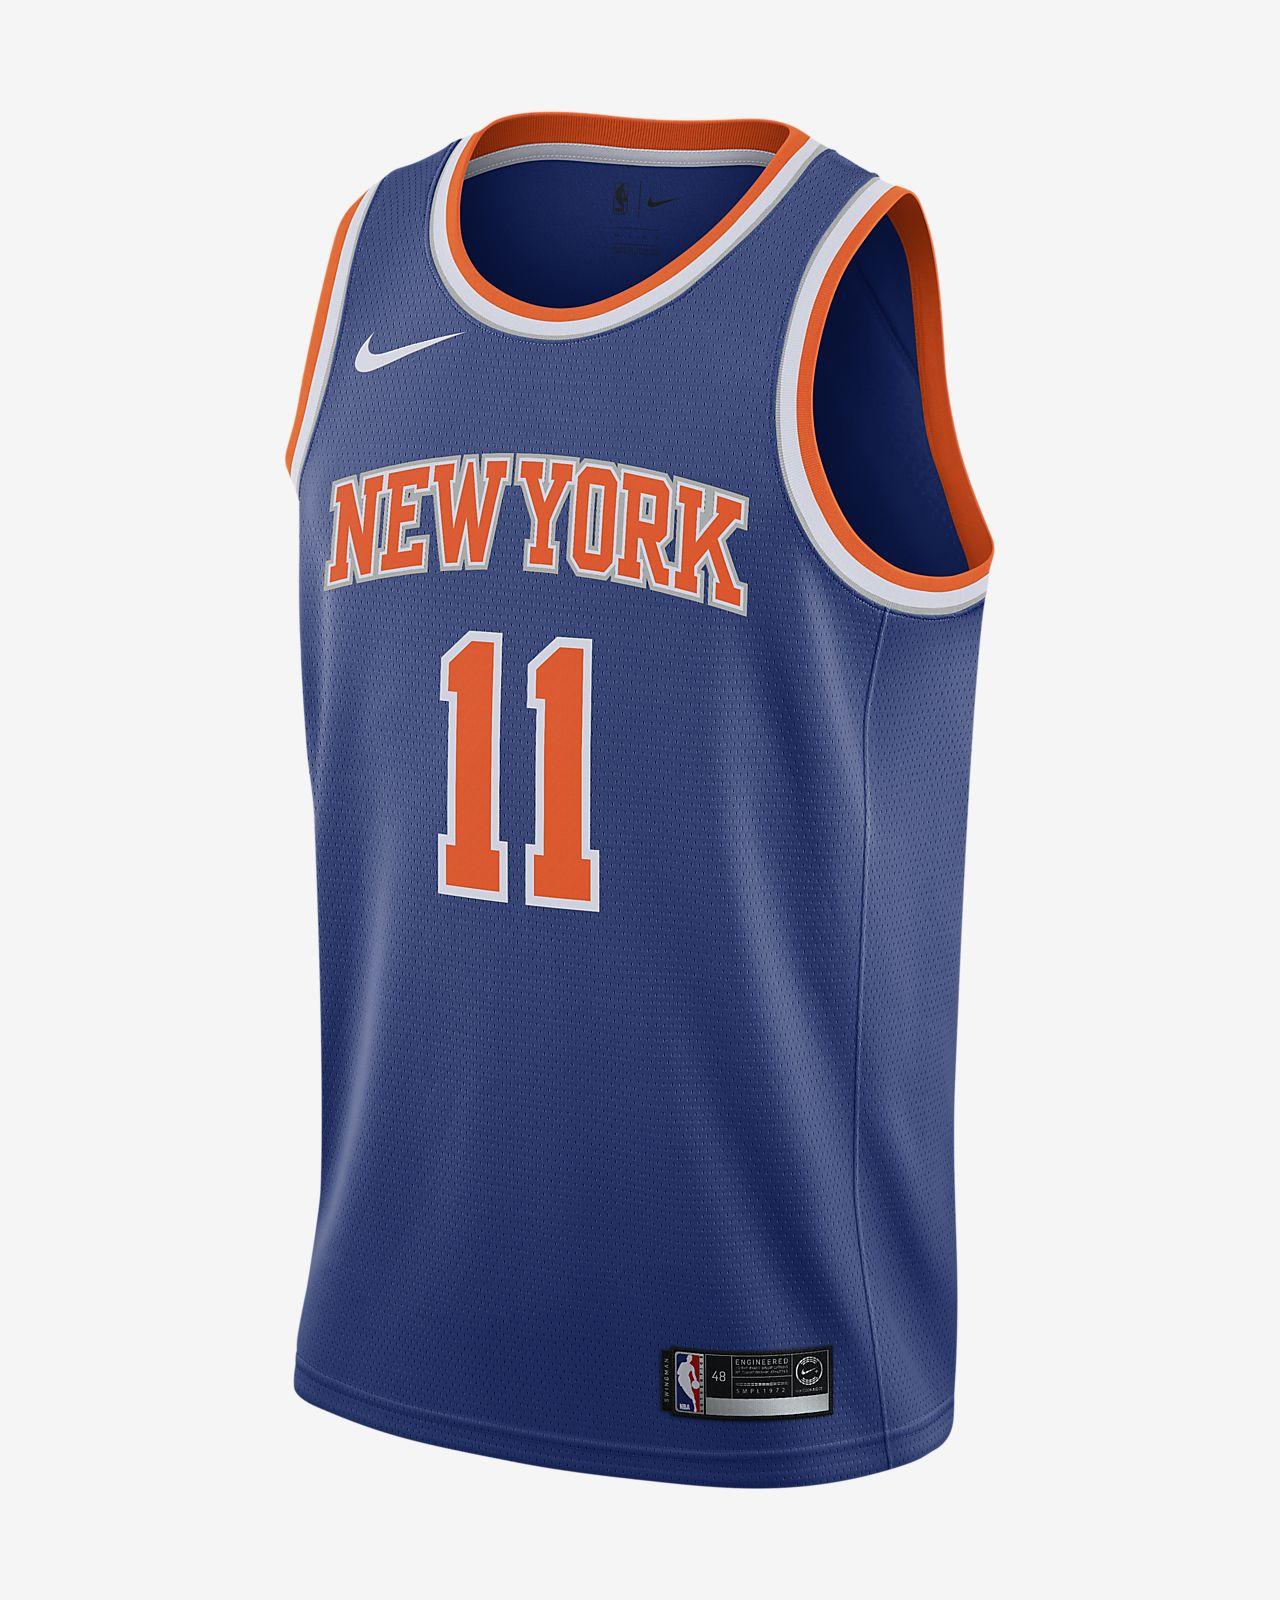 981a48e5cd6 Frank Ntilikina Icon Edition Swingman (New York Knicks) Men s Nike ...